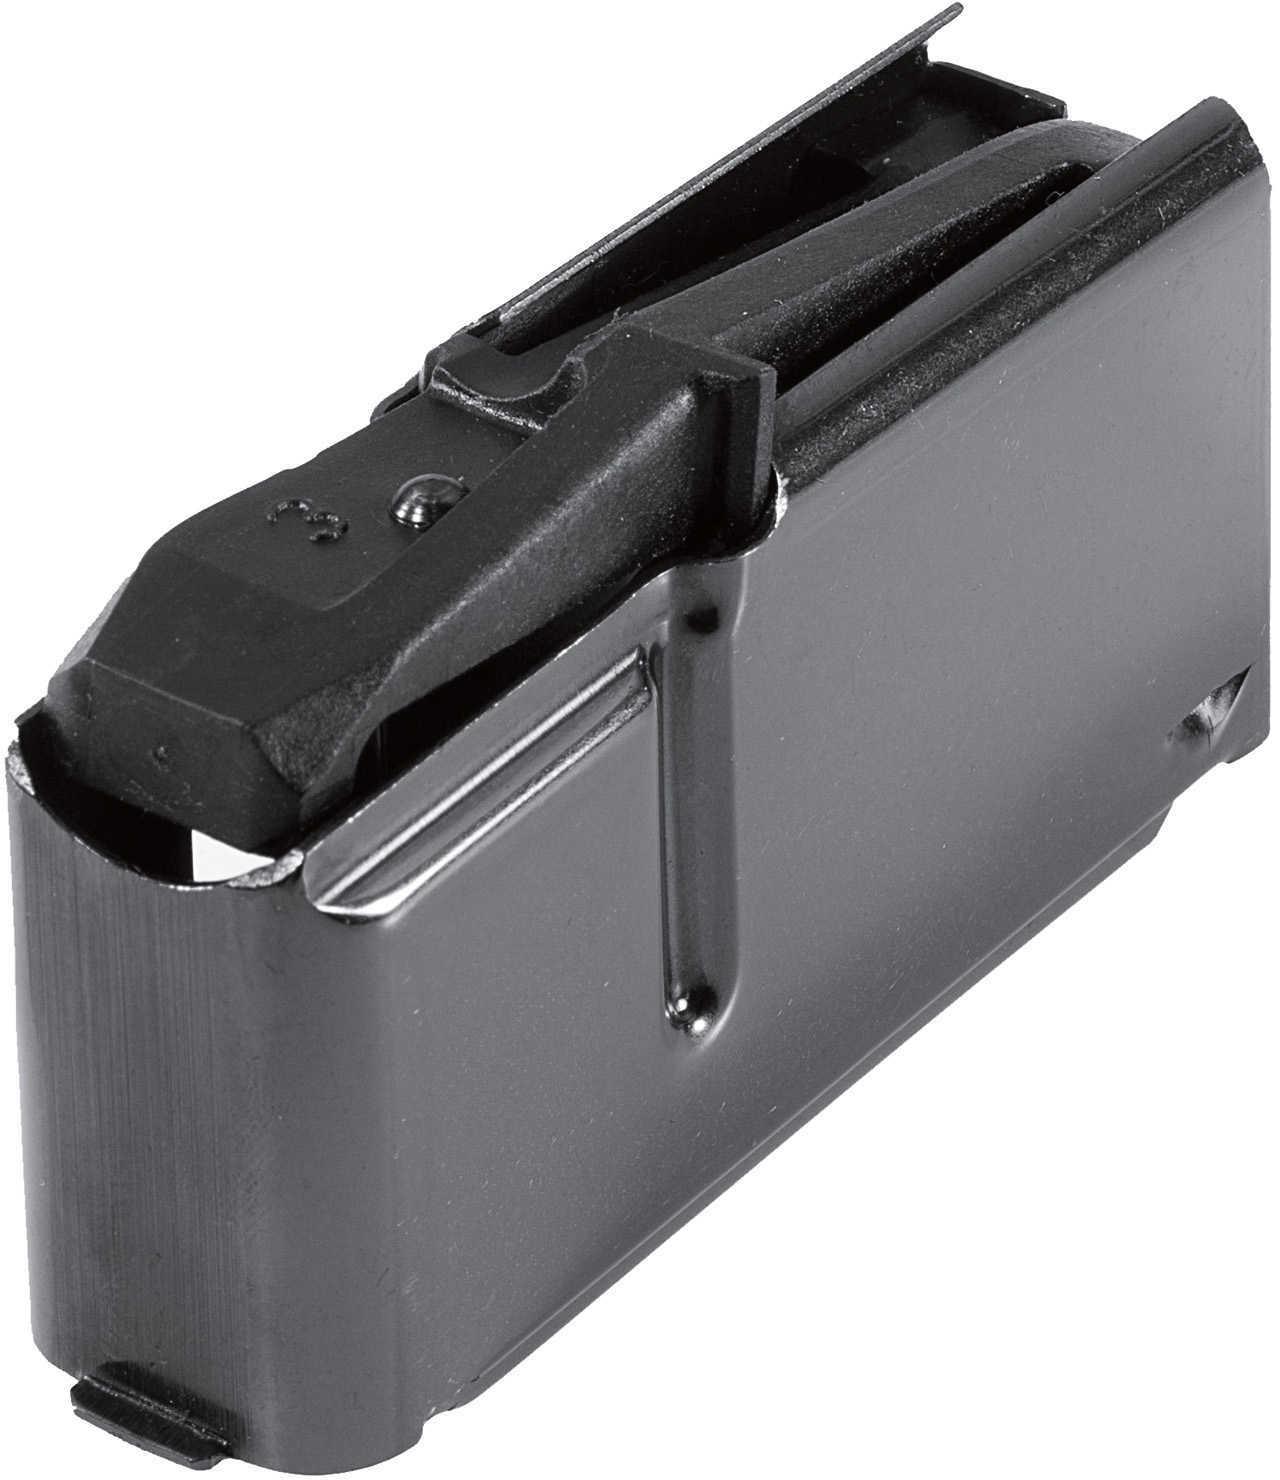 Browning BAR Magazine 338 Winchester Magnum (Mark II), Capacity 3 112025031